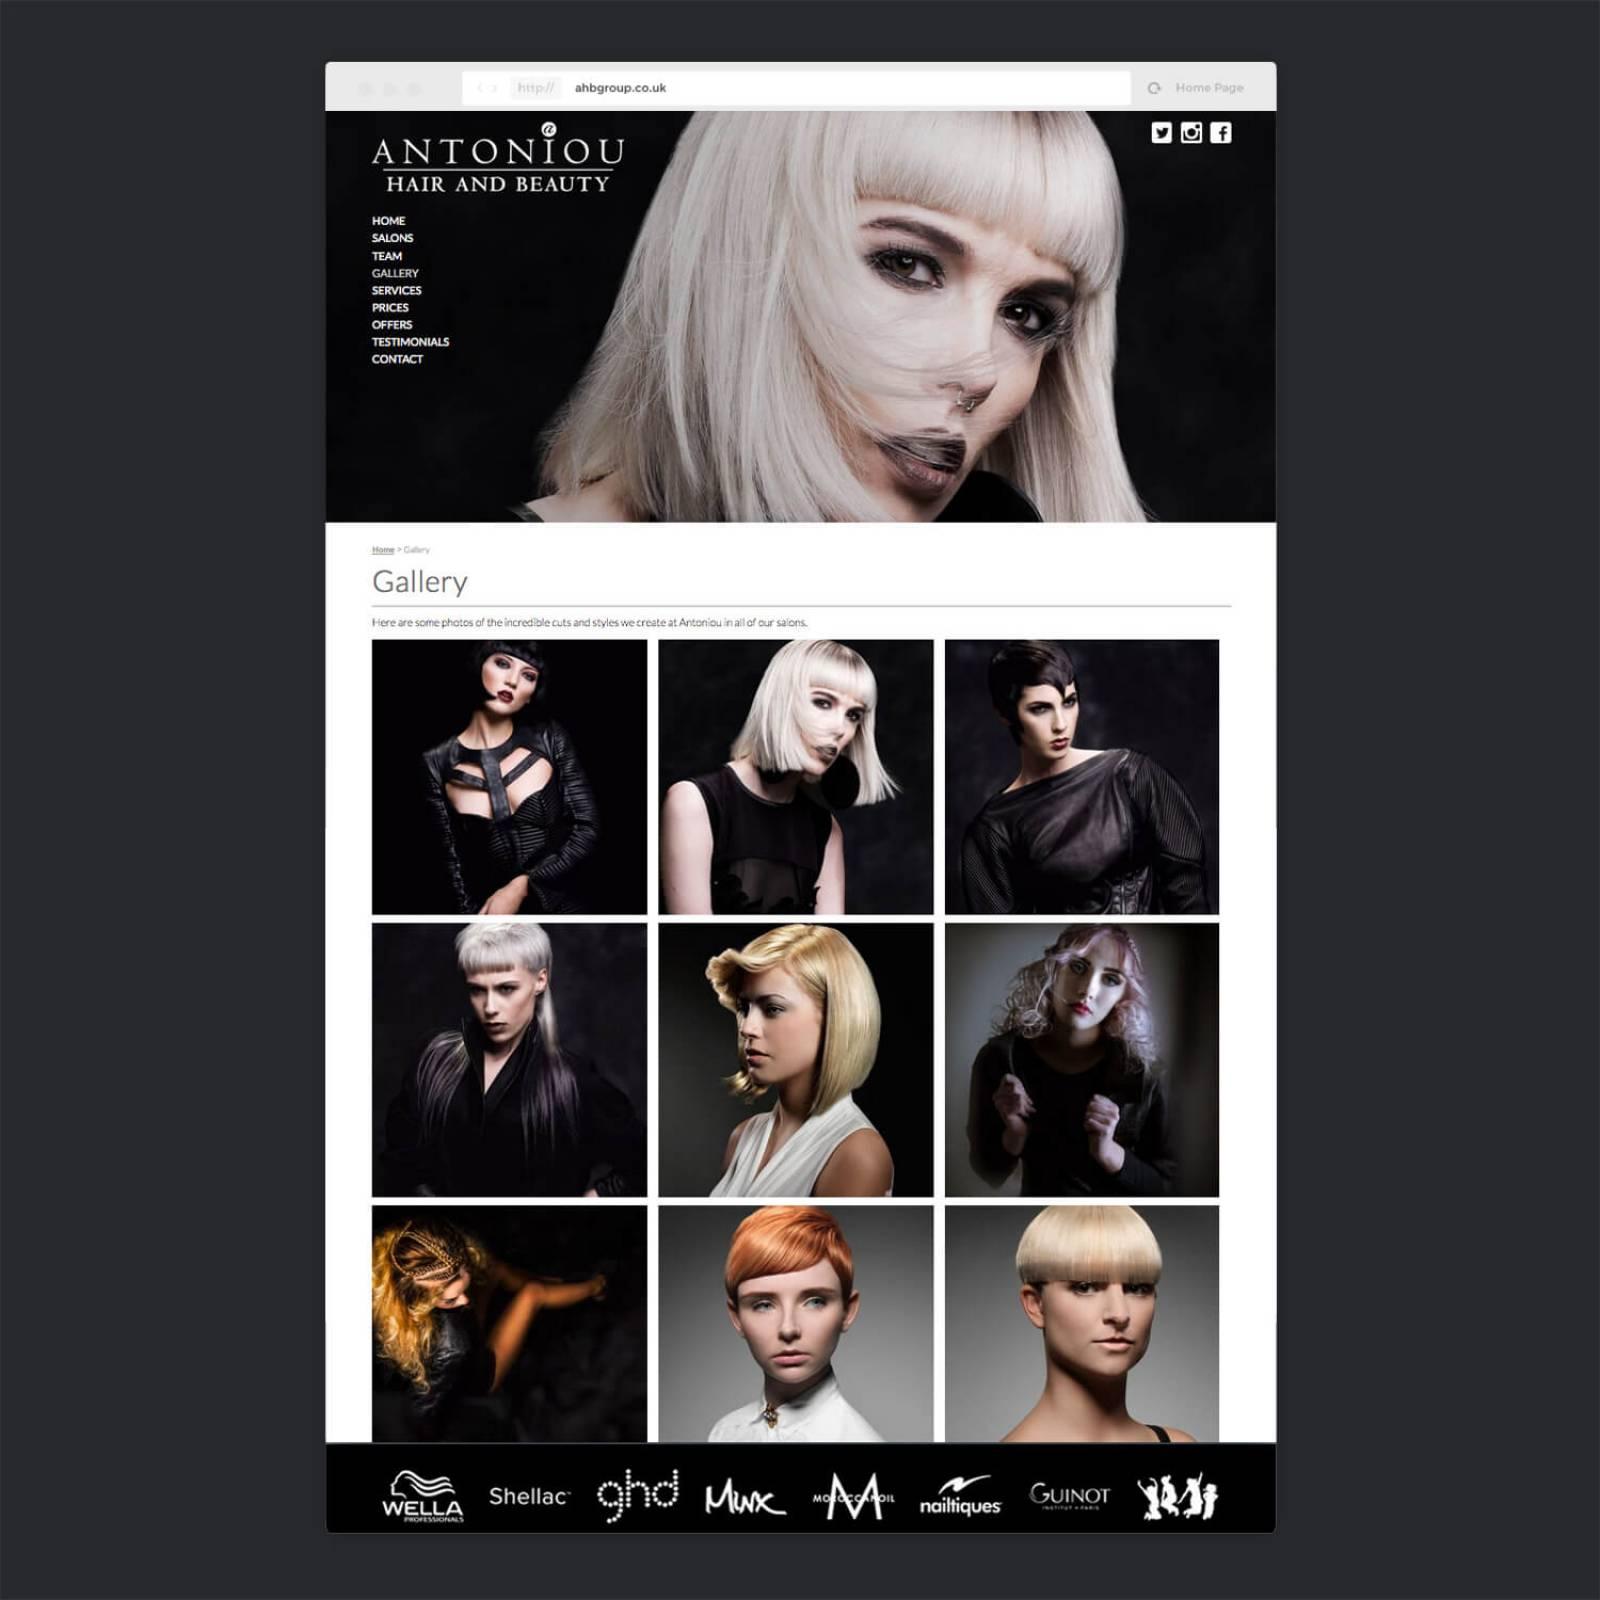 Antoniou-website-design-agency-graphic-design-canterbury-03.jpg